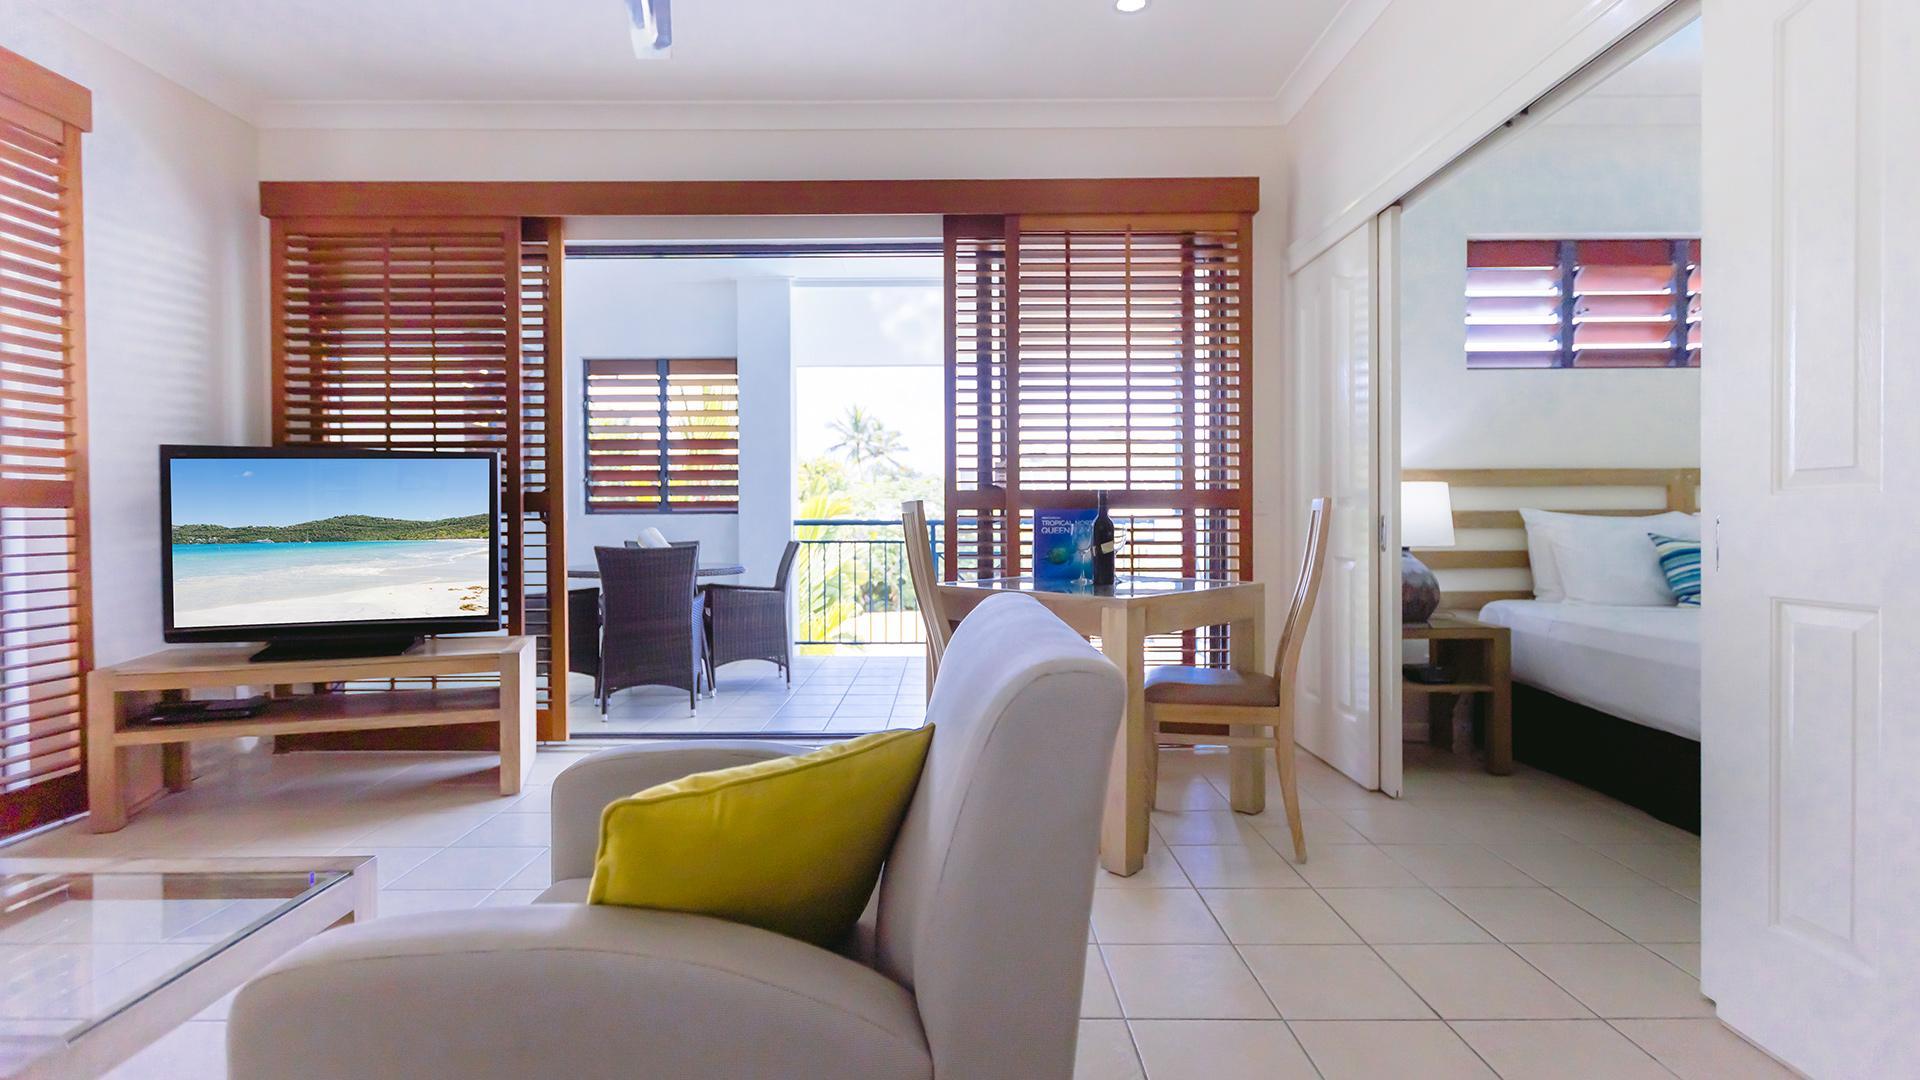 One-Bedroom Premier Apartment image 1 at Meridian Port Douglas by Douglas Shire, Queensland, Australia